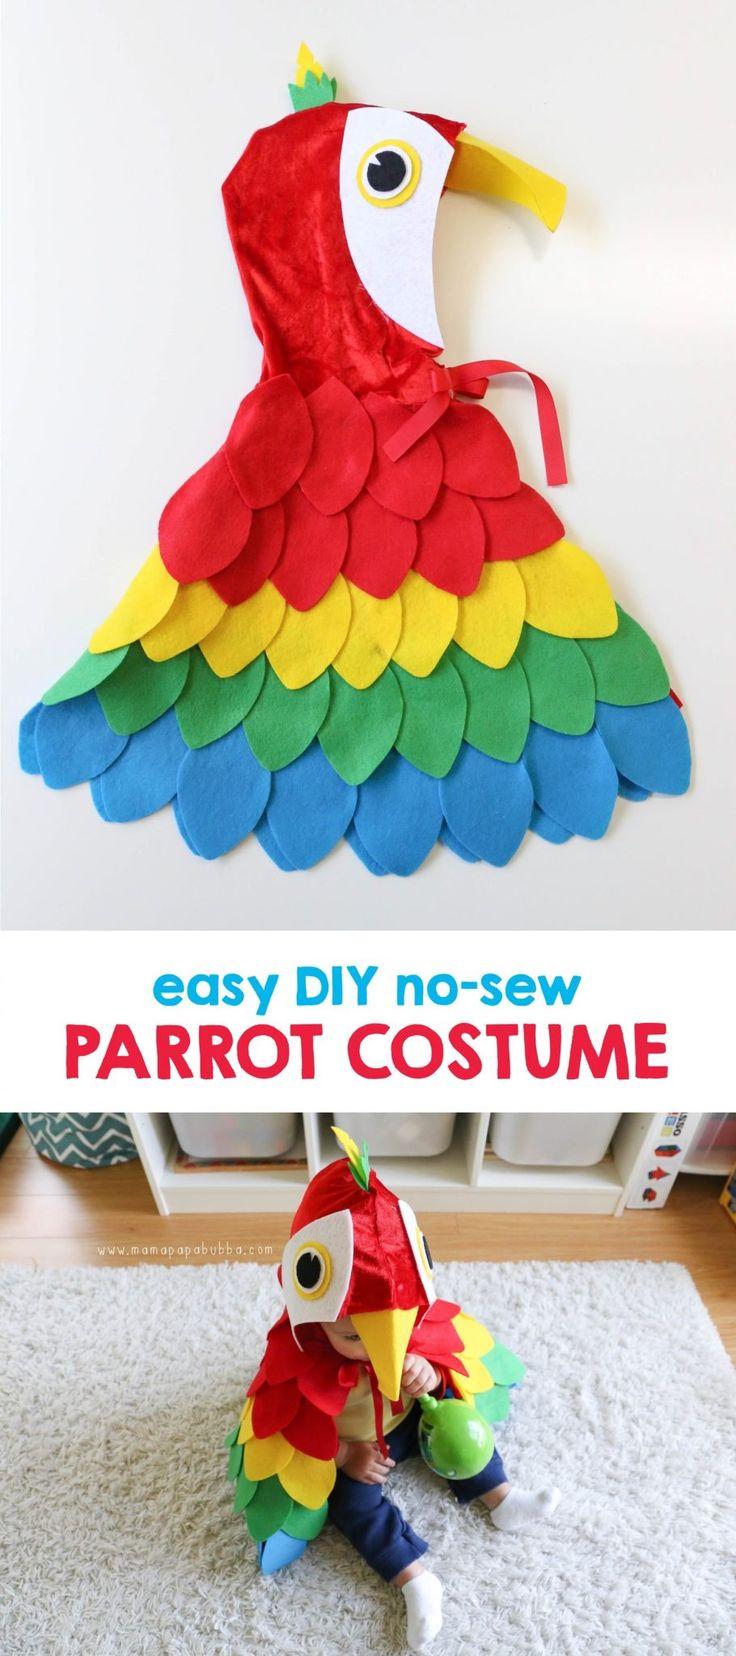 Easy DIY No-Sew Parrot Costume